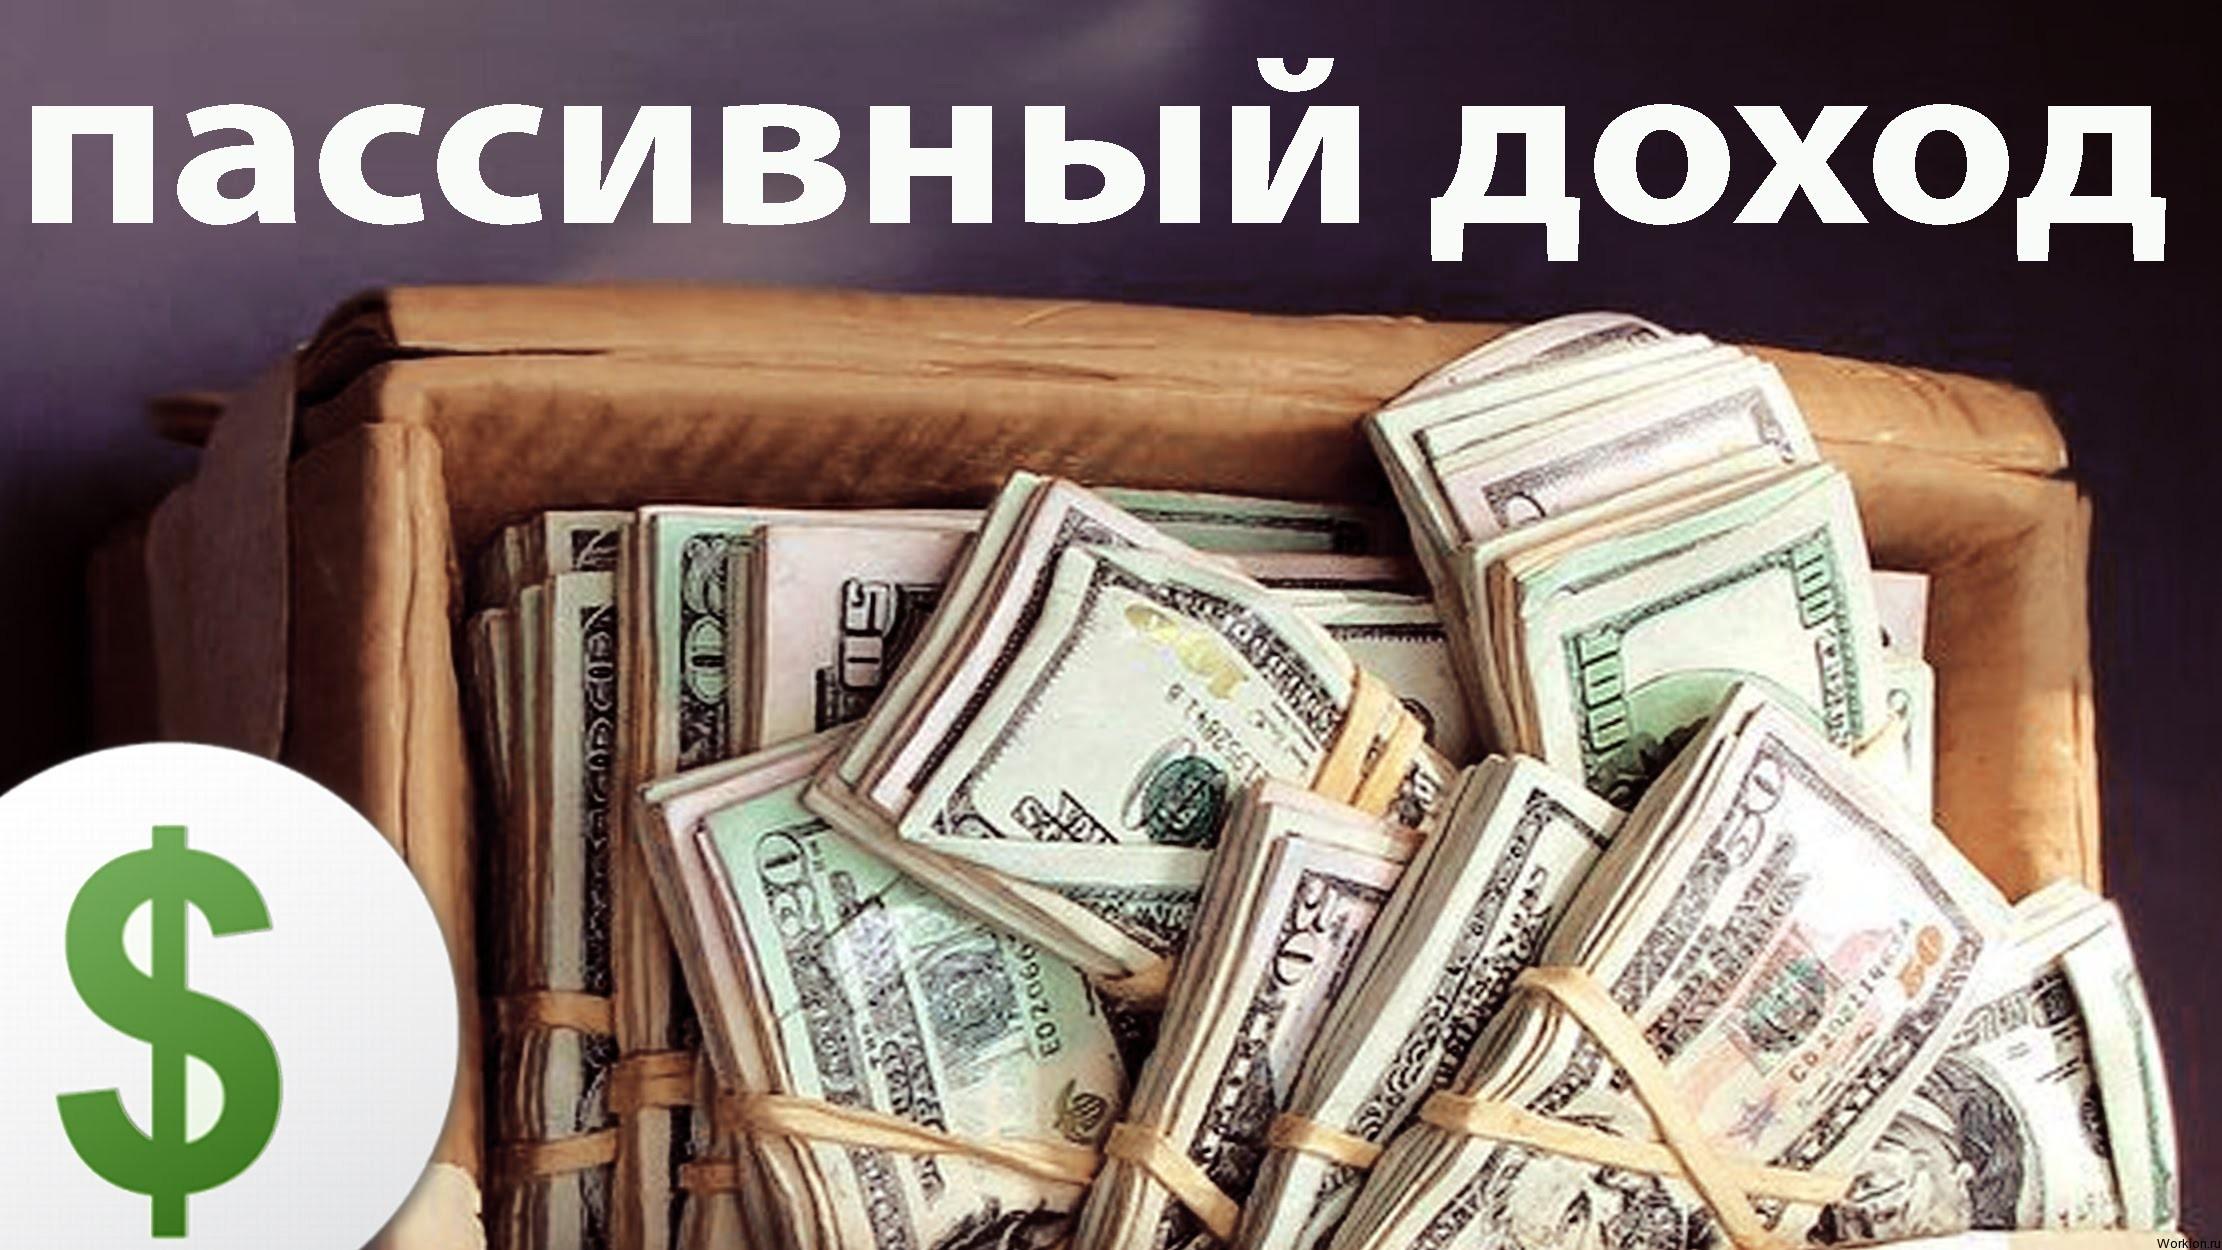 Cum sa faci bani online fara investitii: idei si metode